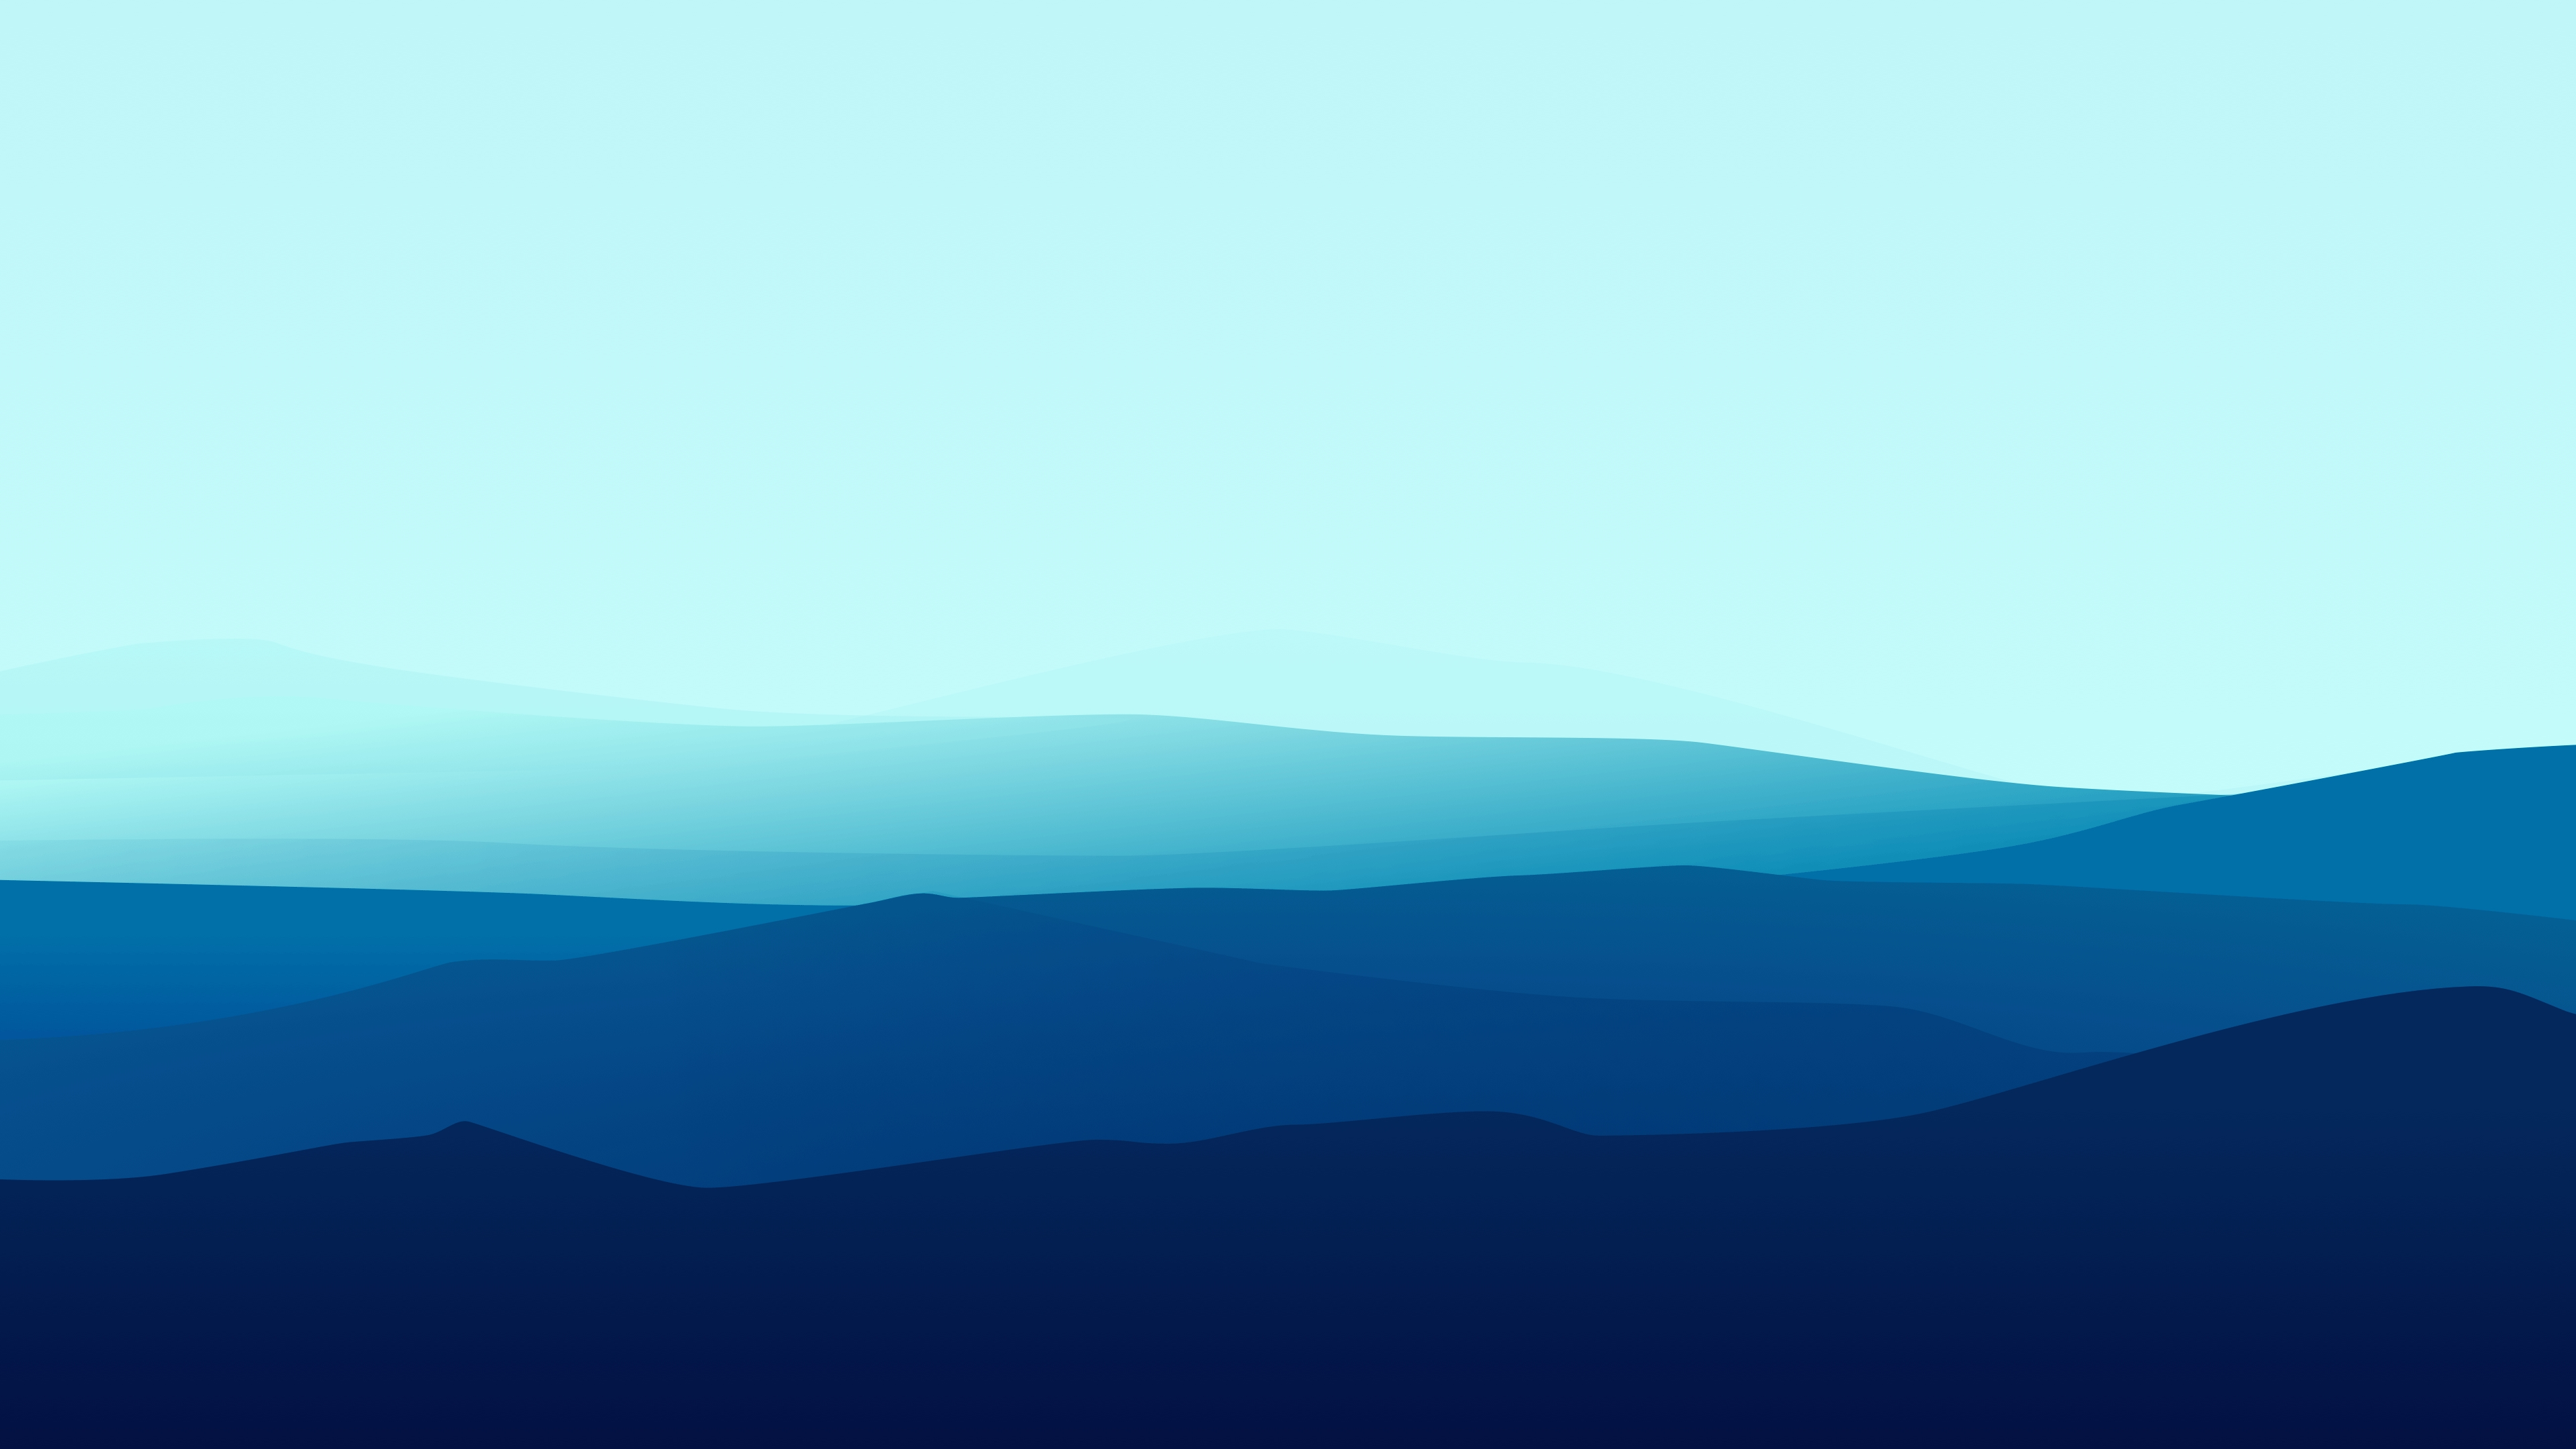 Fondos de pantalla Montañas Minimalista Degradado Azul